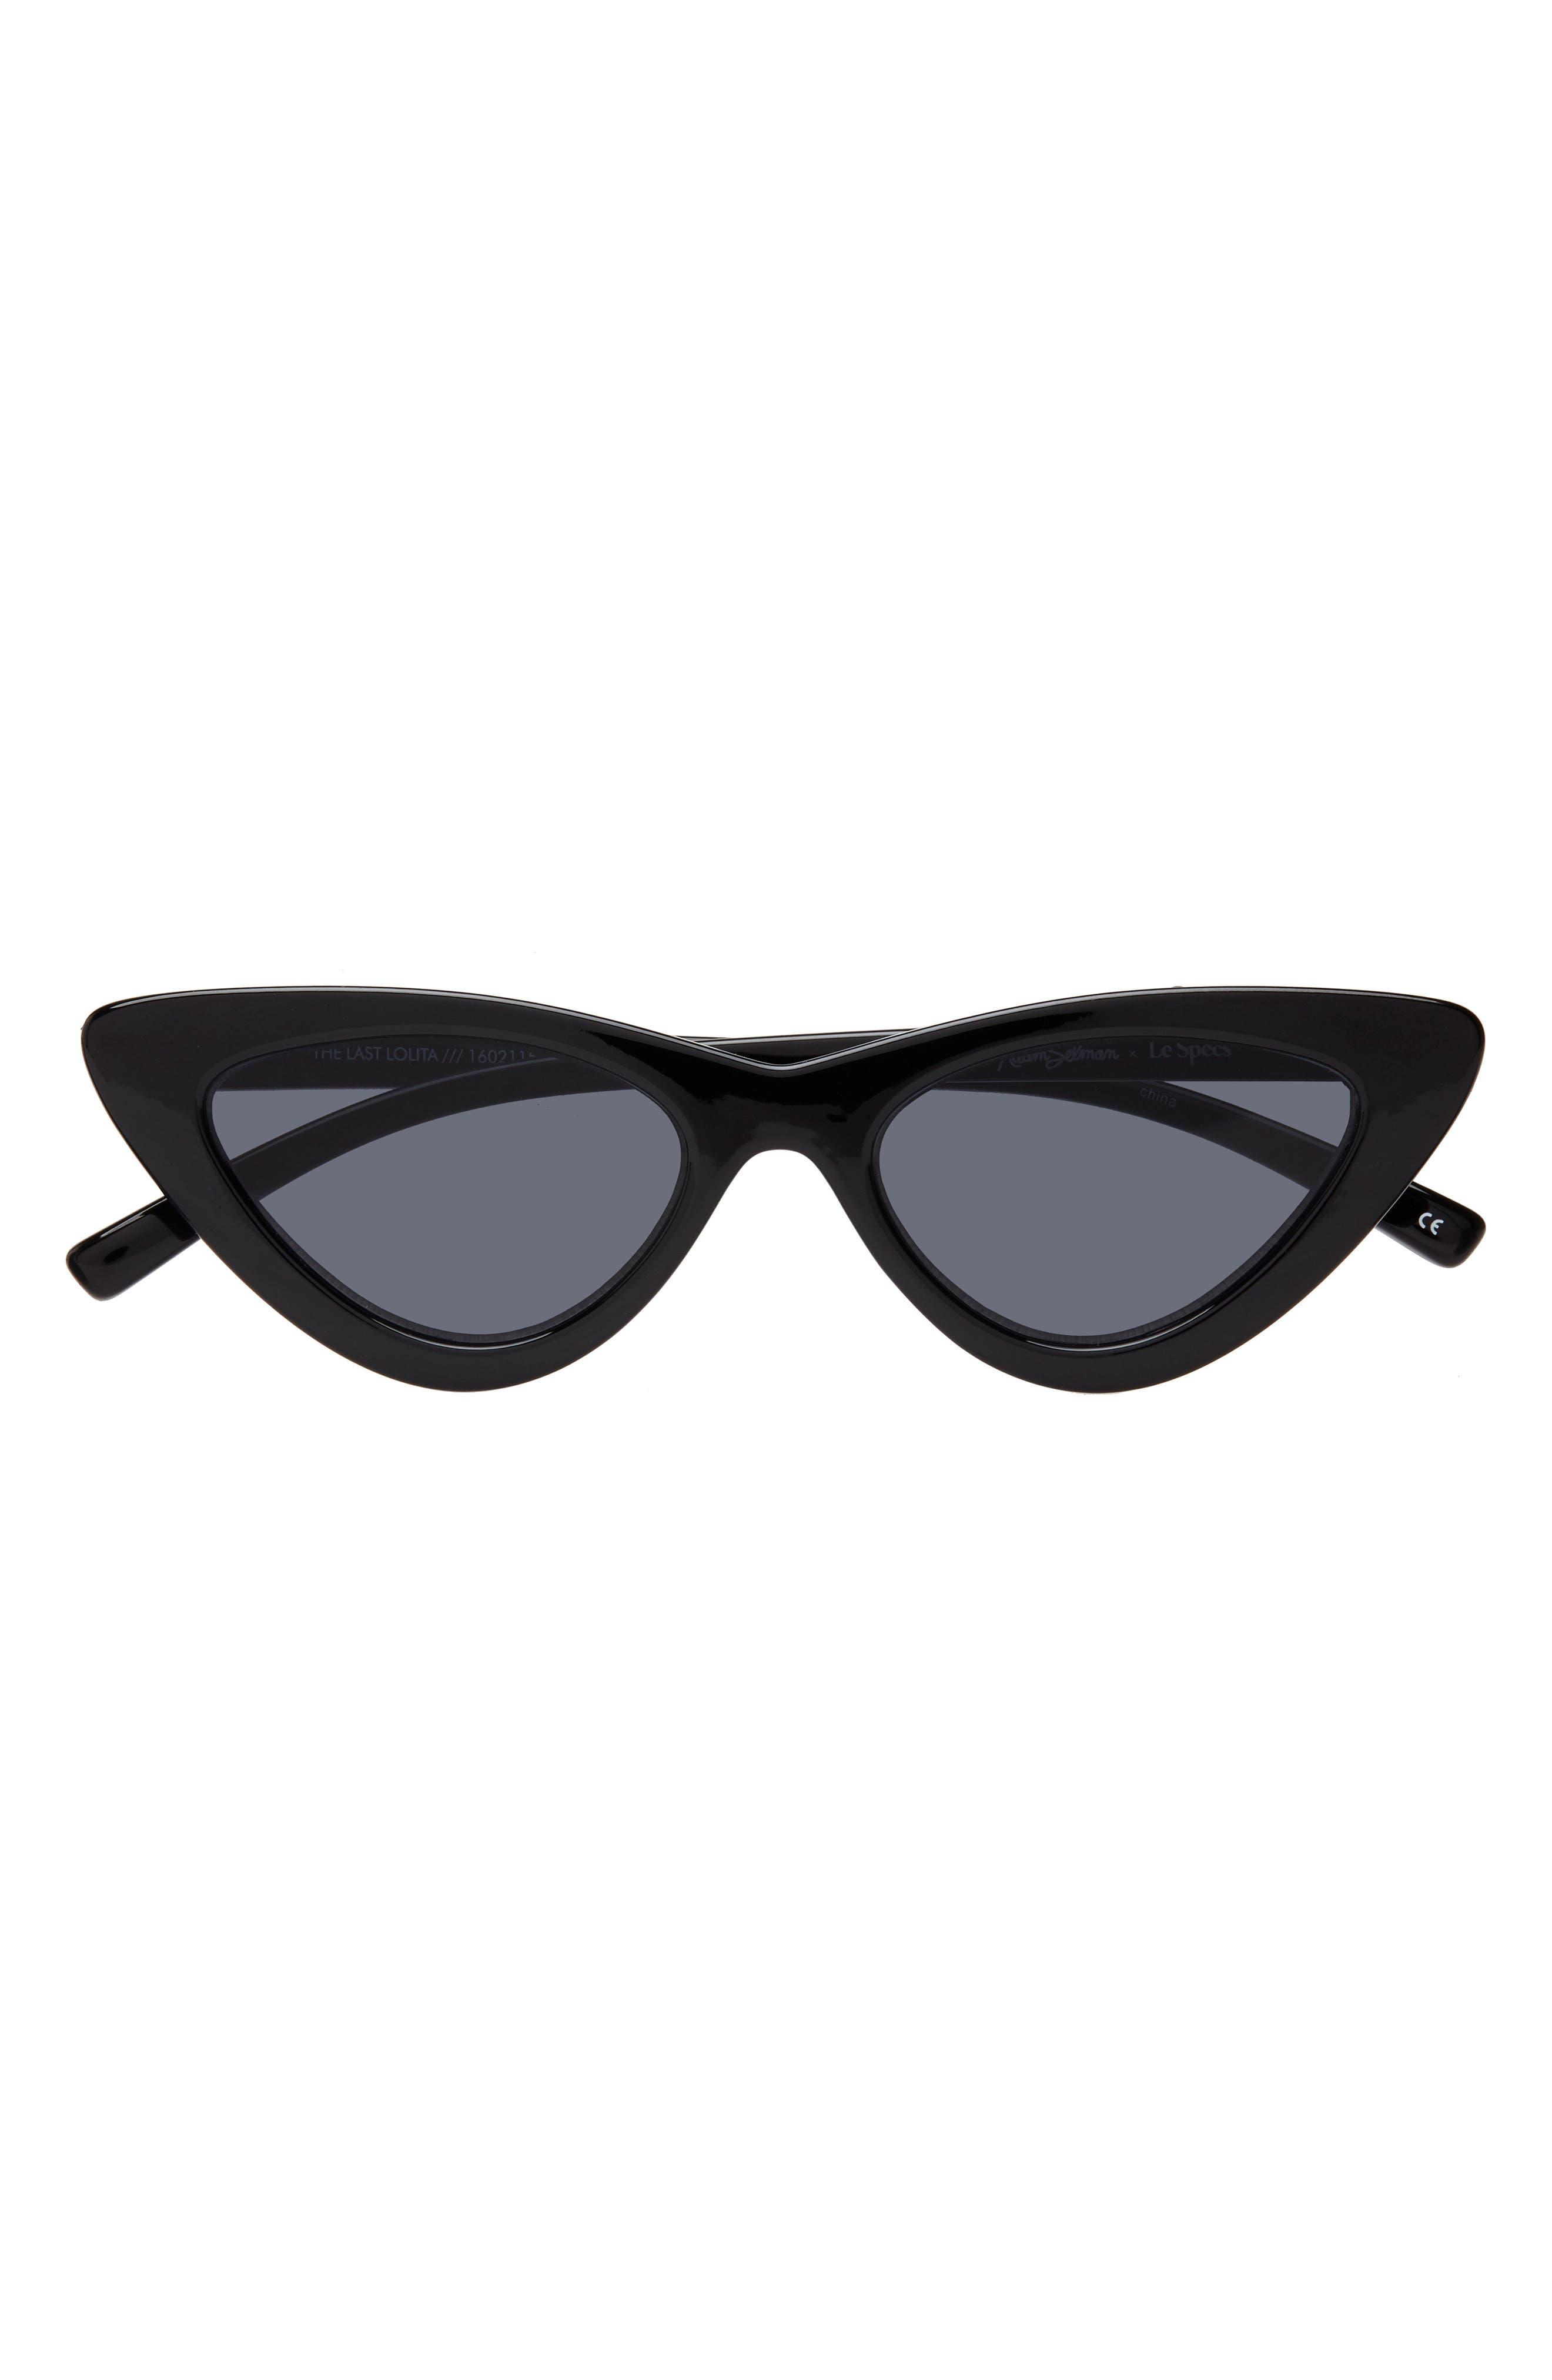 ADAM SELMAN X LE SPECS LUXE, Lolita 49mm Cat Eye Sunglasses, Main thumbnail 1, color, BLACK